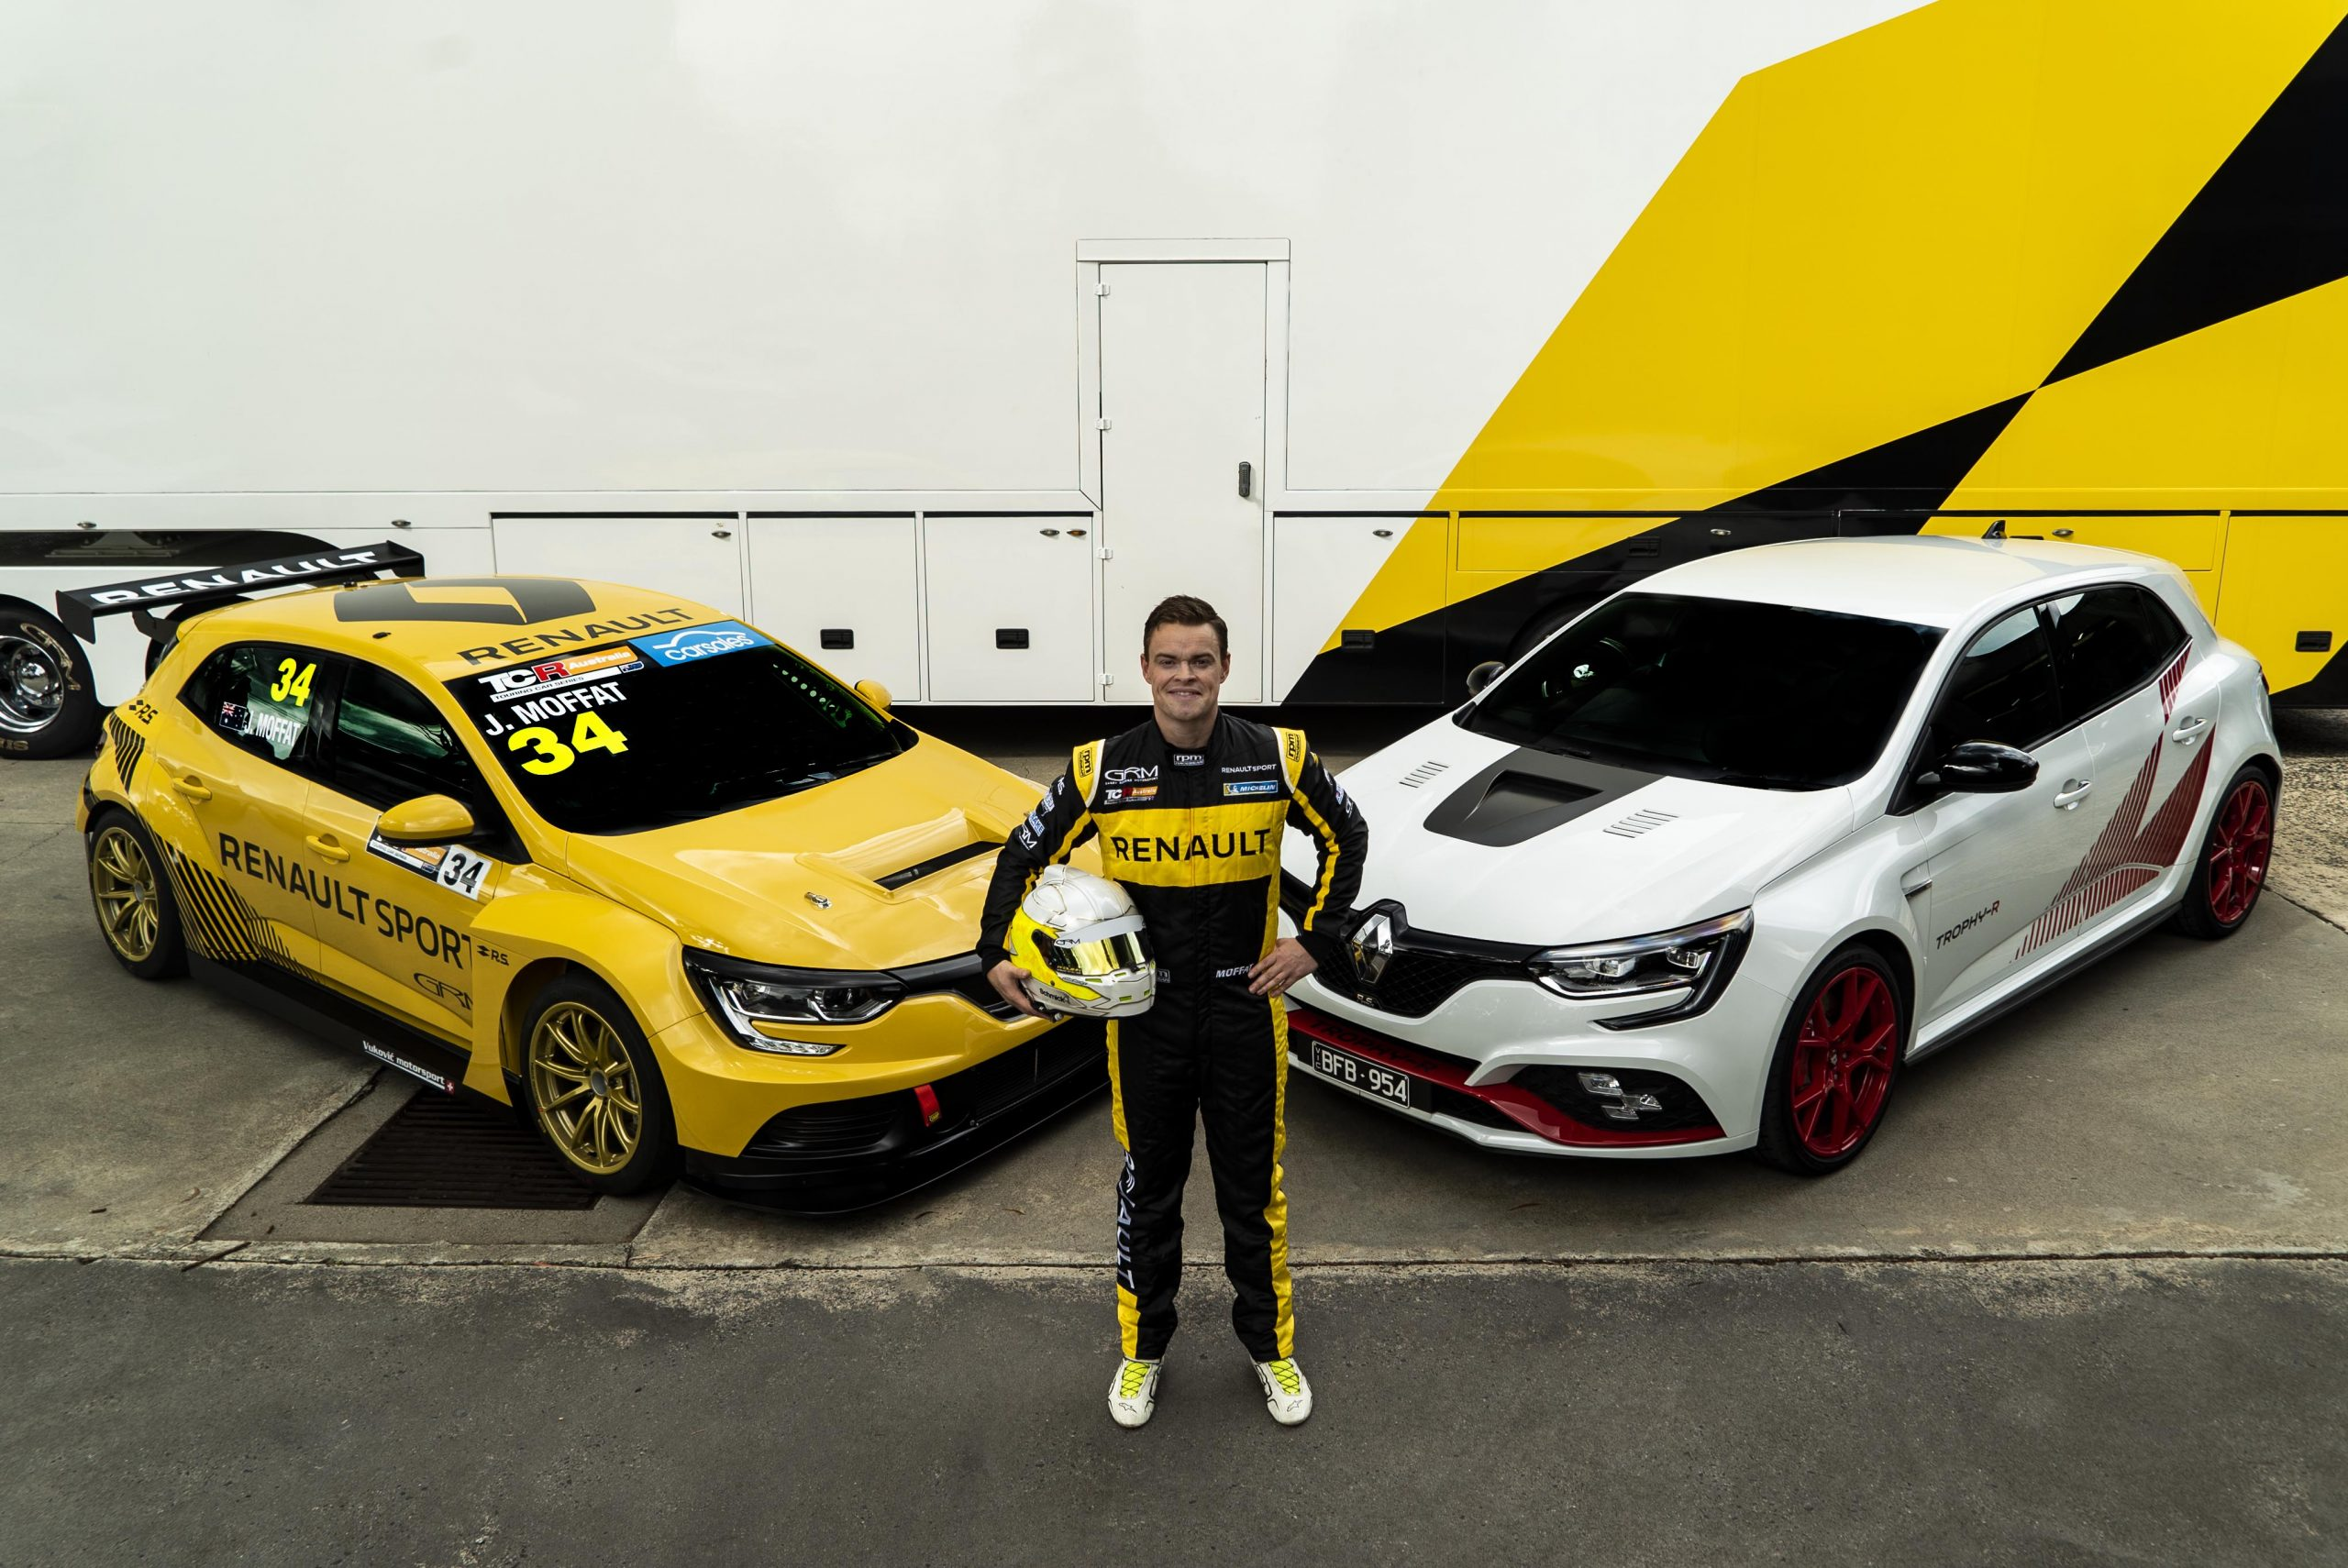 New Renault Sport GRM #34 Car Revealed